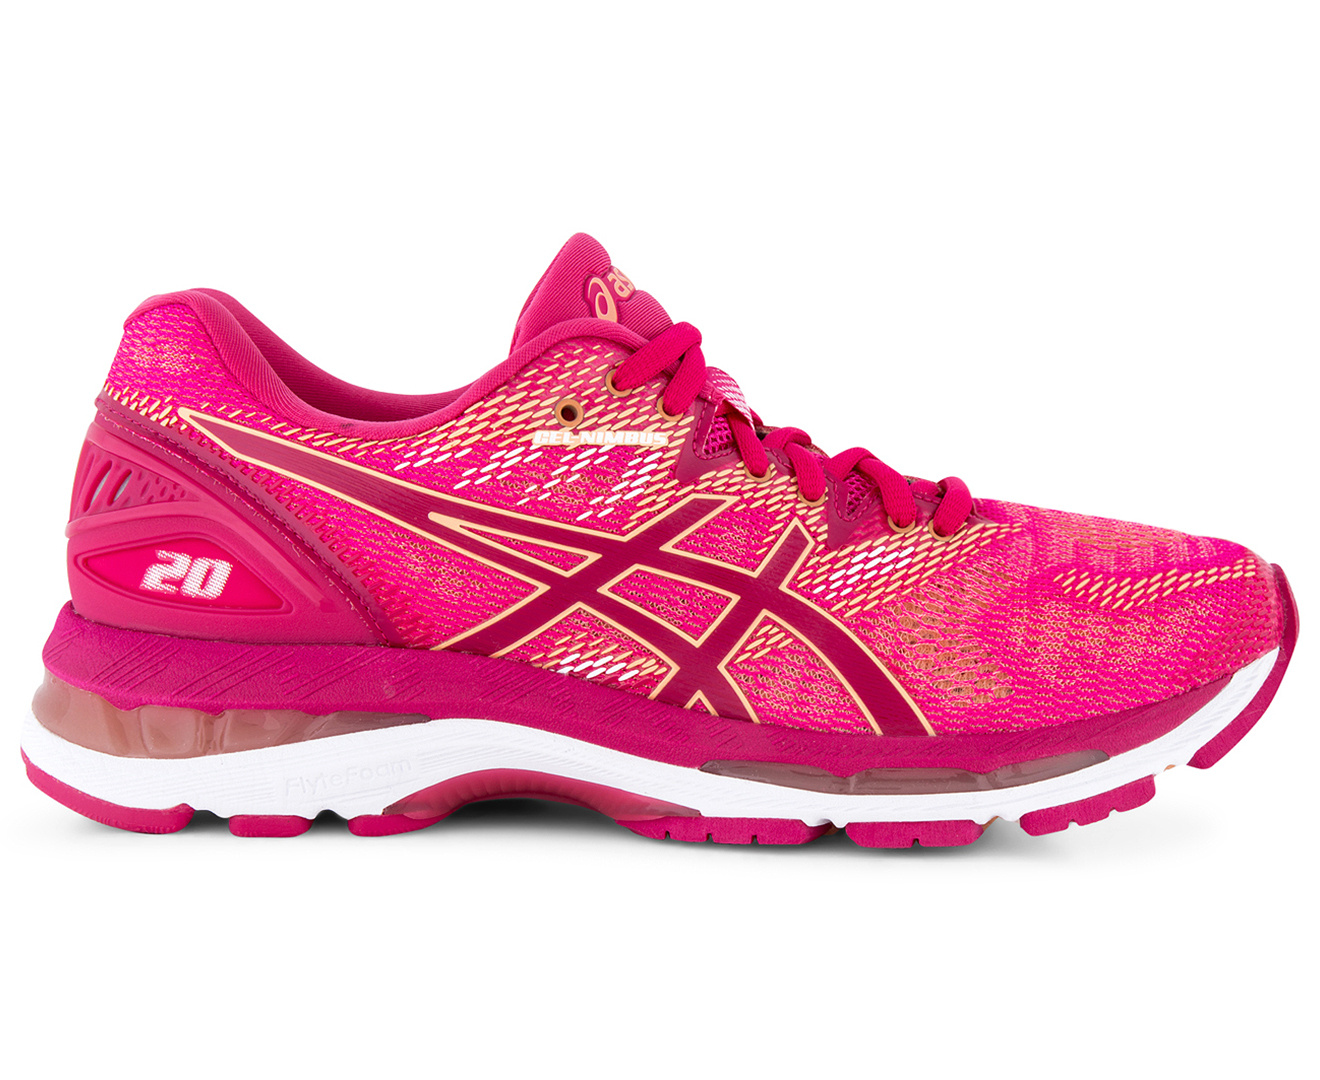 a632d6ebe937 ASICS Women s GEL-Nimbus 20 Shoe - Bright Rose Bright Rose Apricot ...